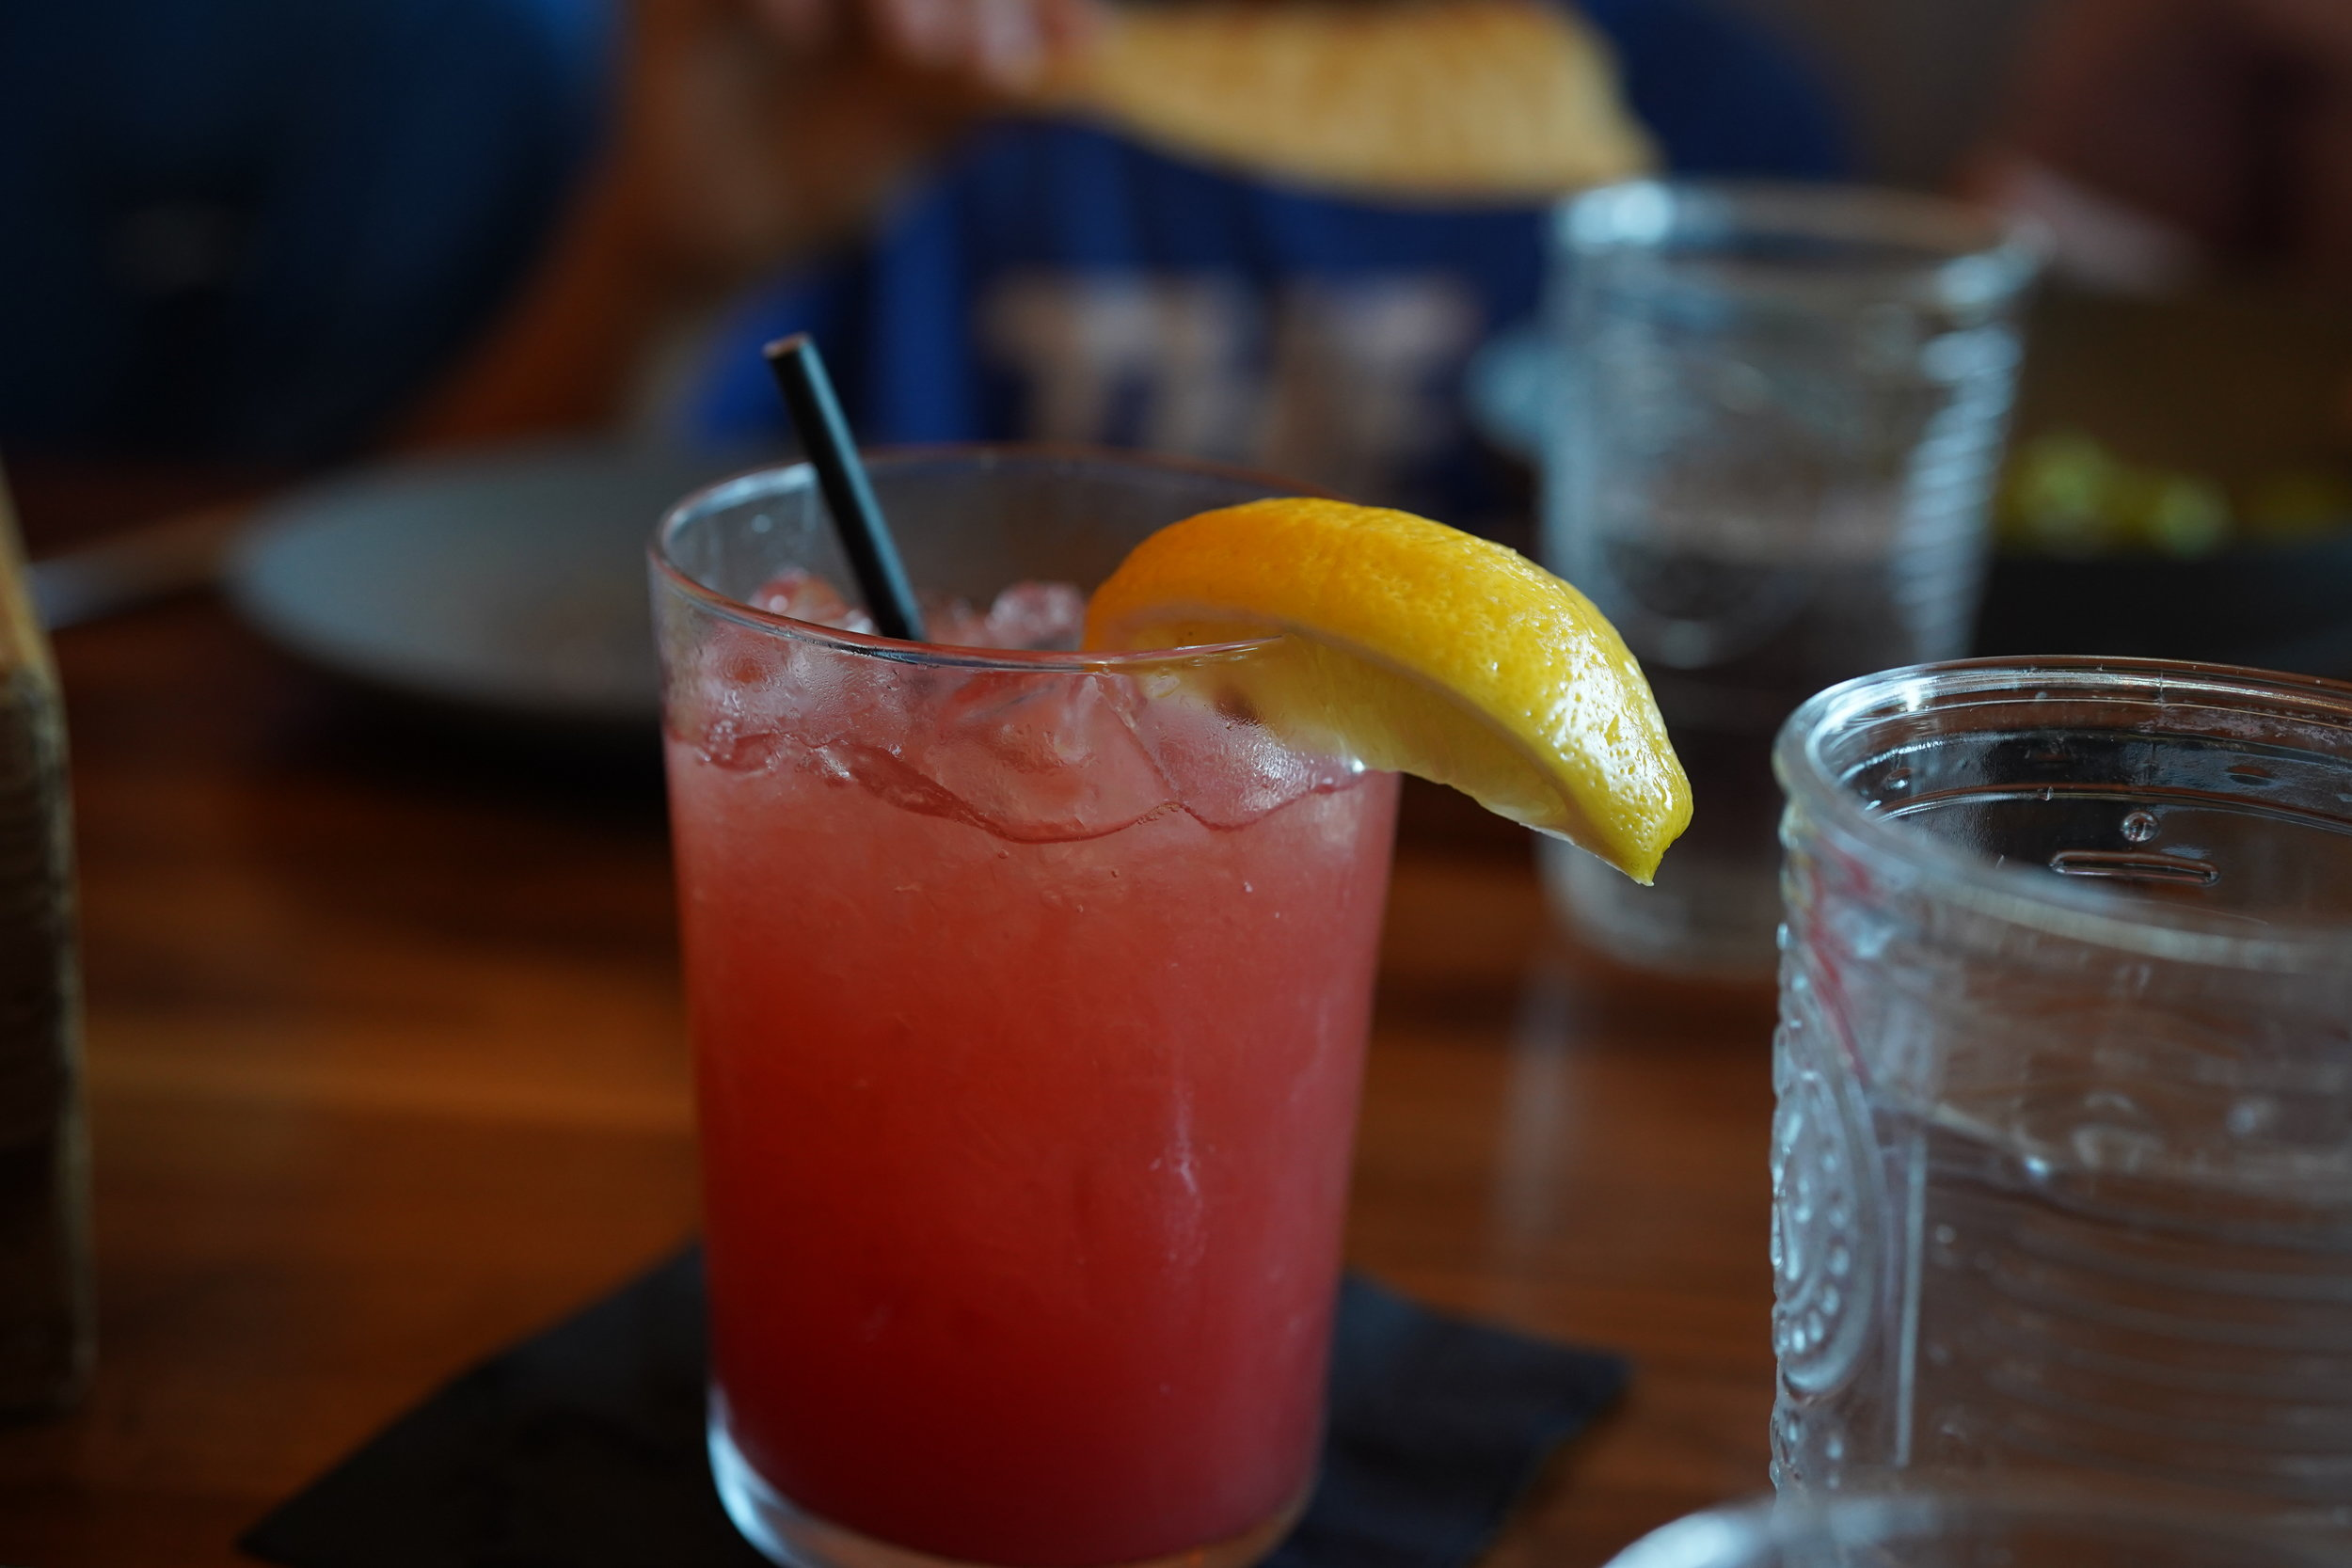 Watermelon and Lemonade (Seasonal)